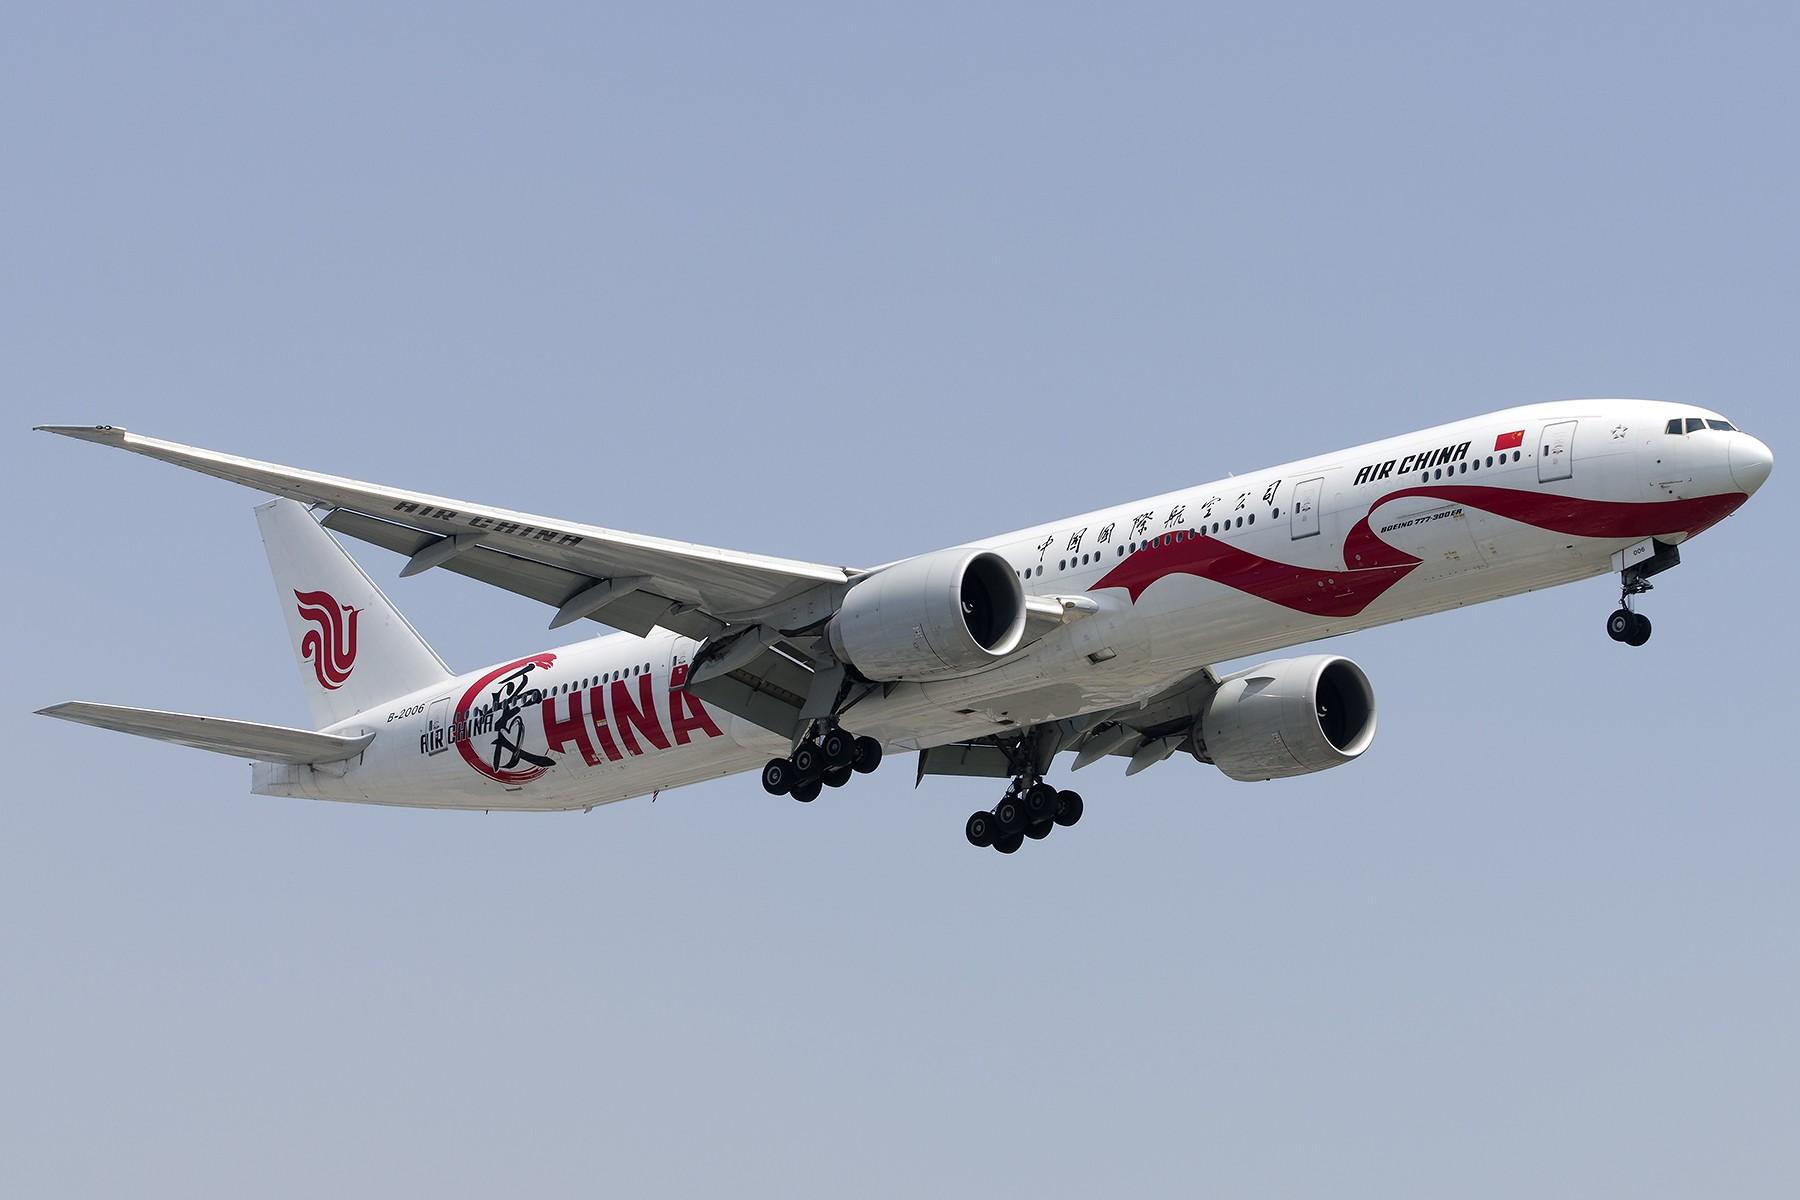 Re:[原创][原创]【SHA拍机*1800大图】4月拍的了,记得那天好货还挺多 BOEING 777-300ER B-2006 中国上海虹桥国际机场